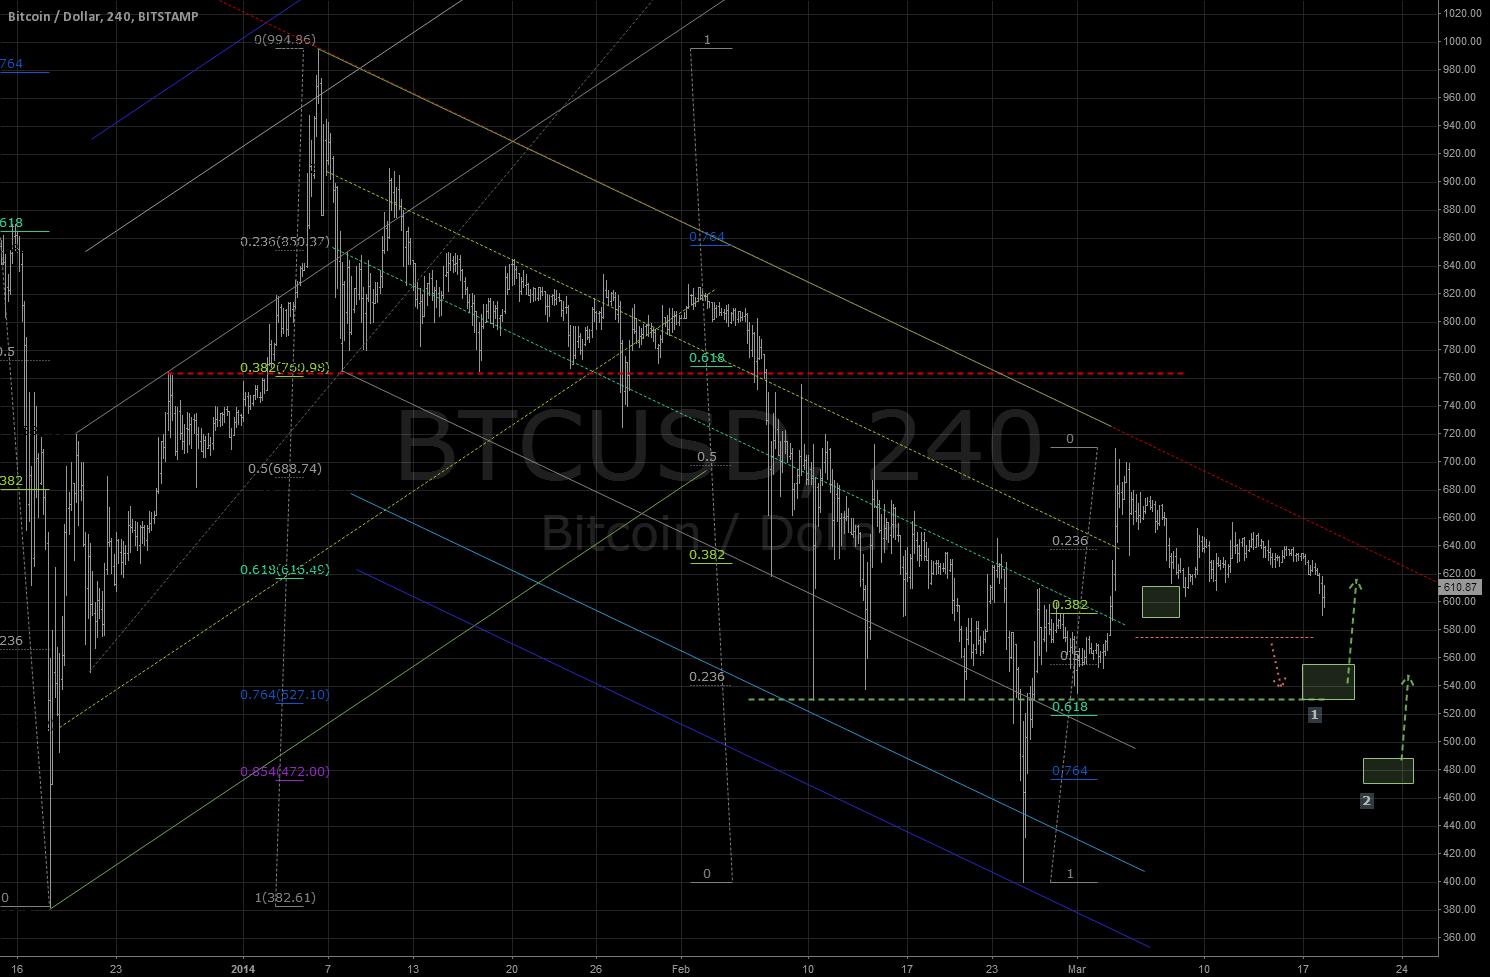 Emerging H&S pattern?